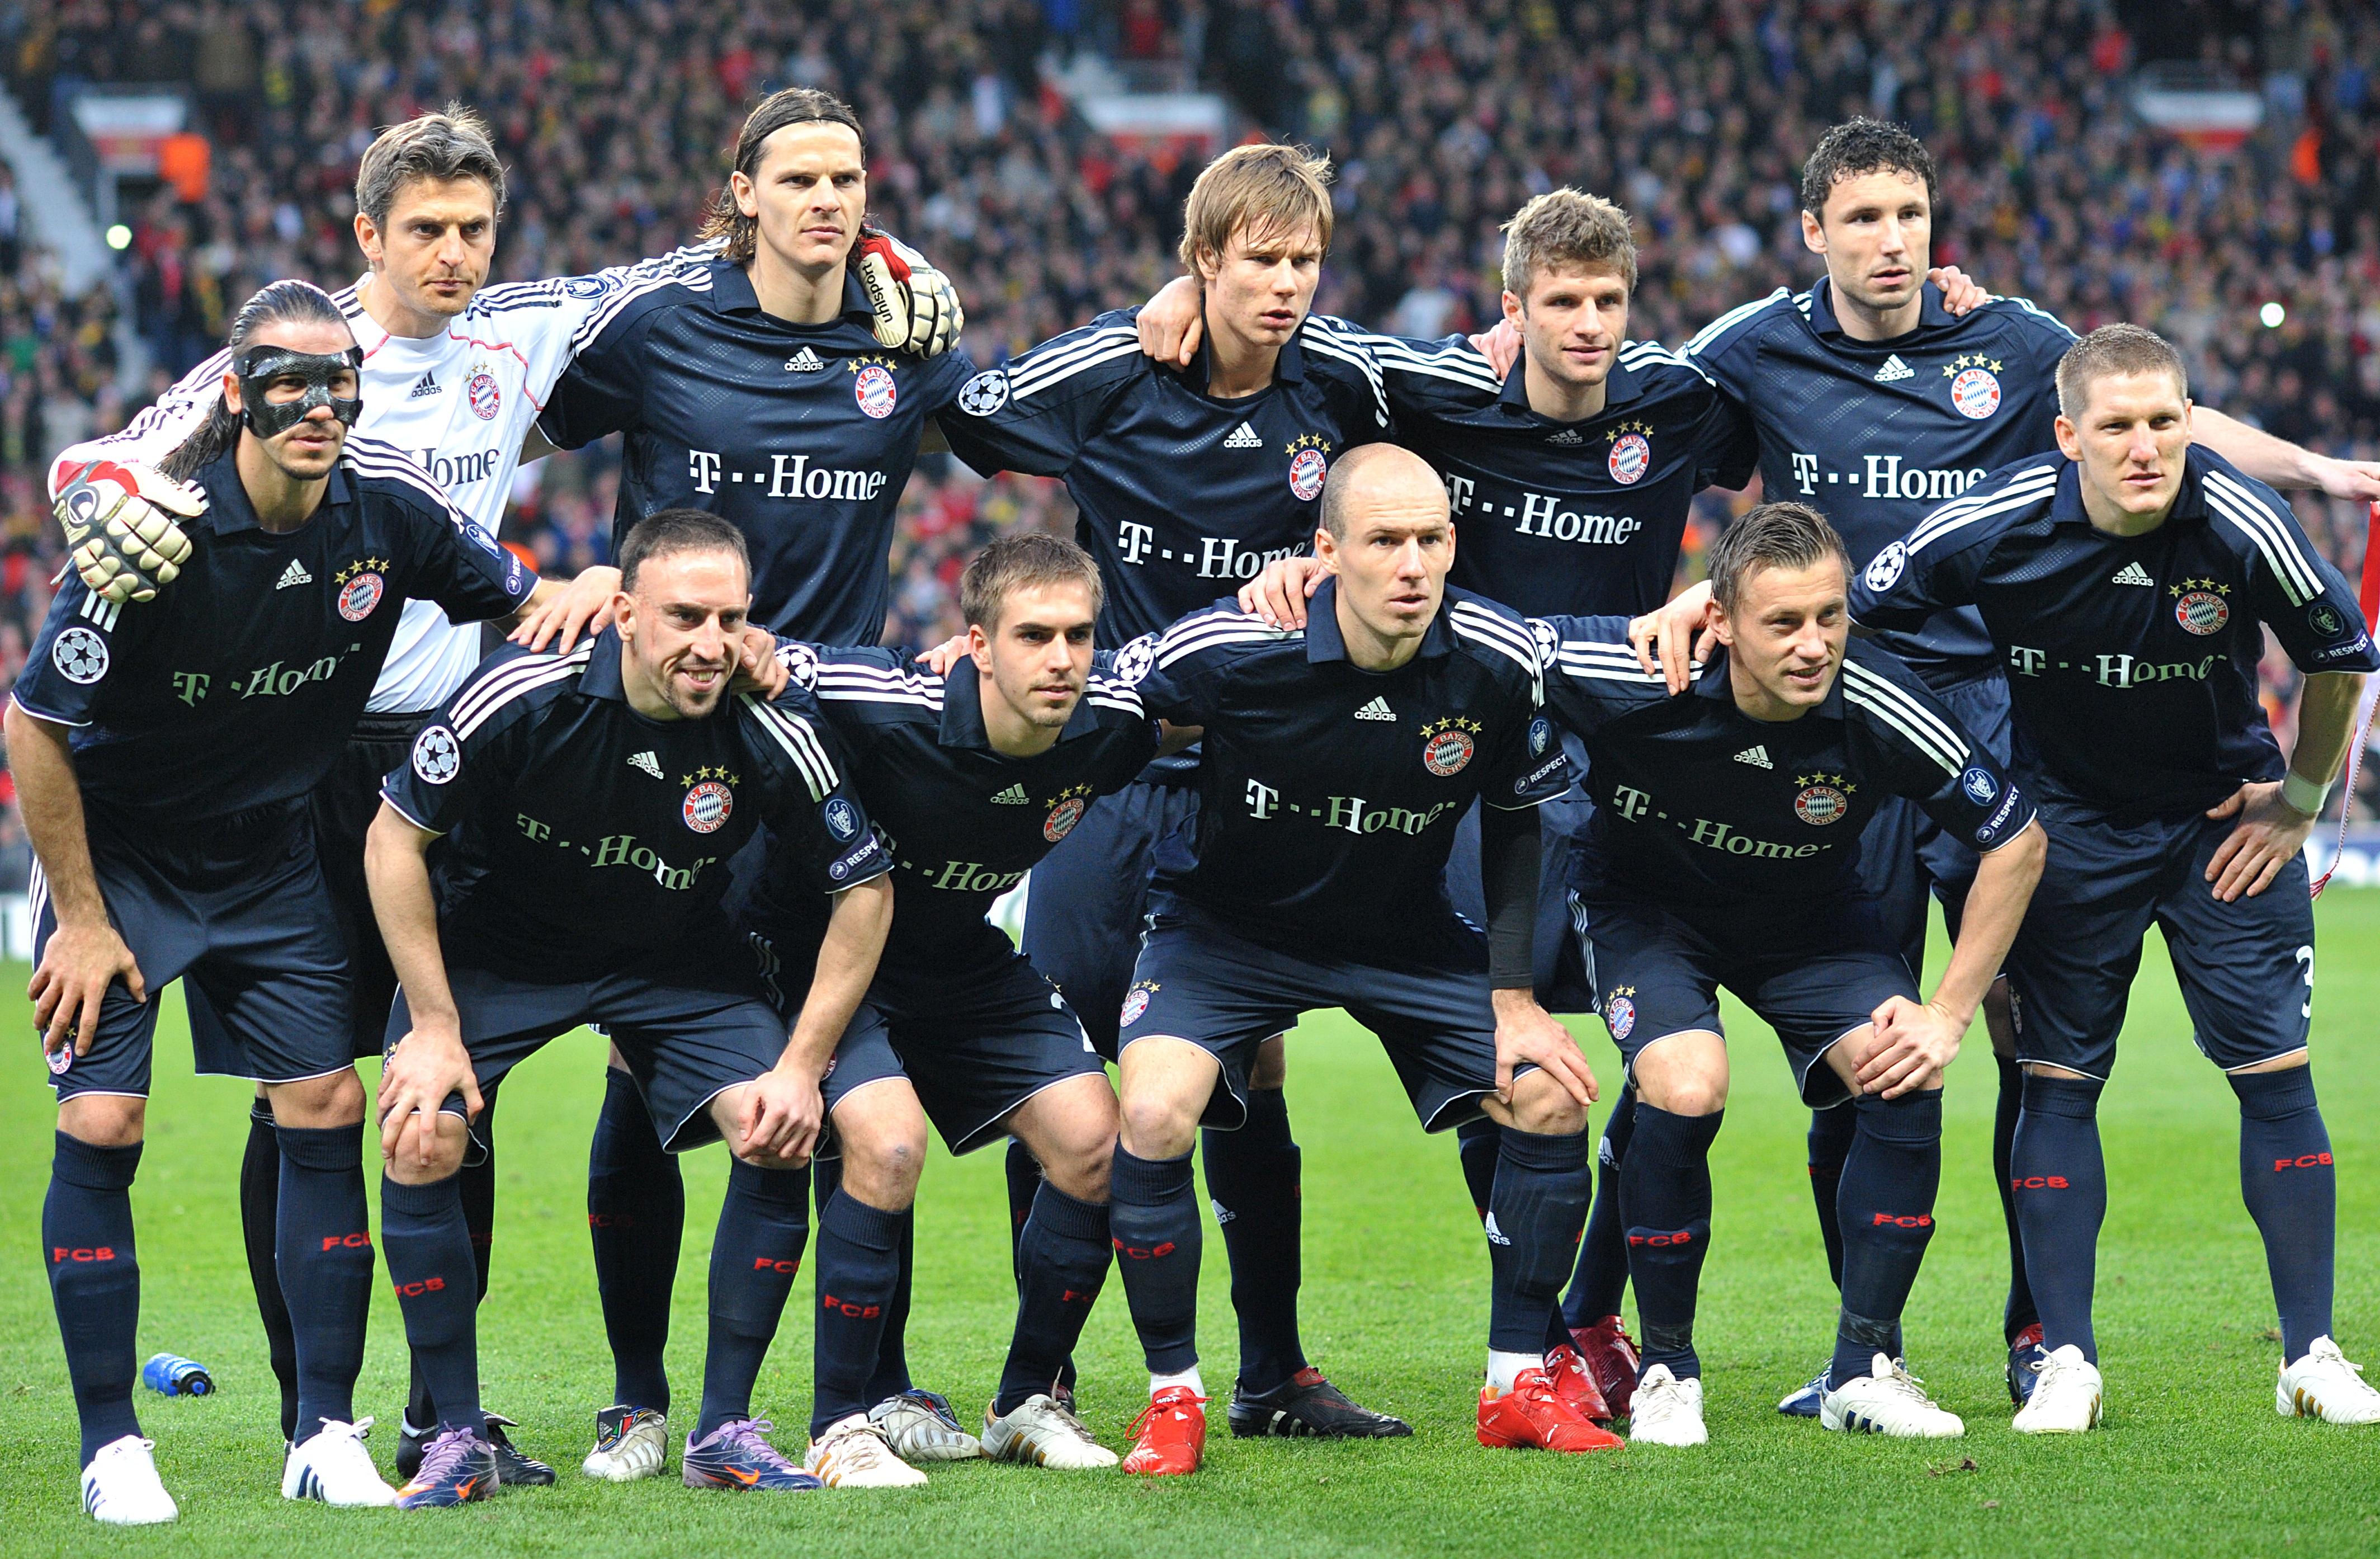 Soccer - UEFA Champions League - Quarter Final - Second Leg - Manchester United v Bayern Munich - Old Trafford